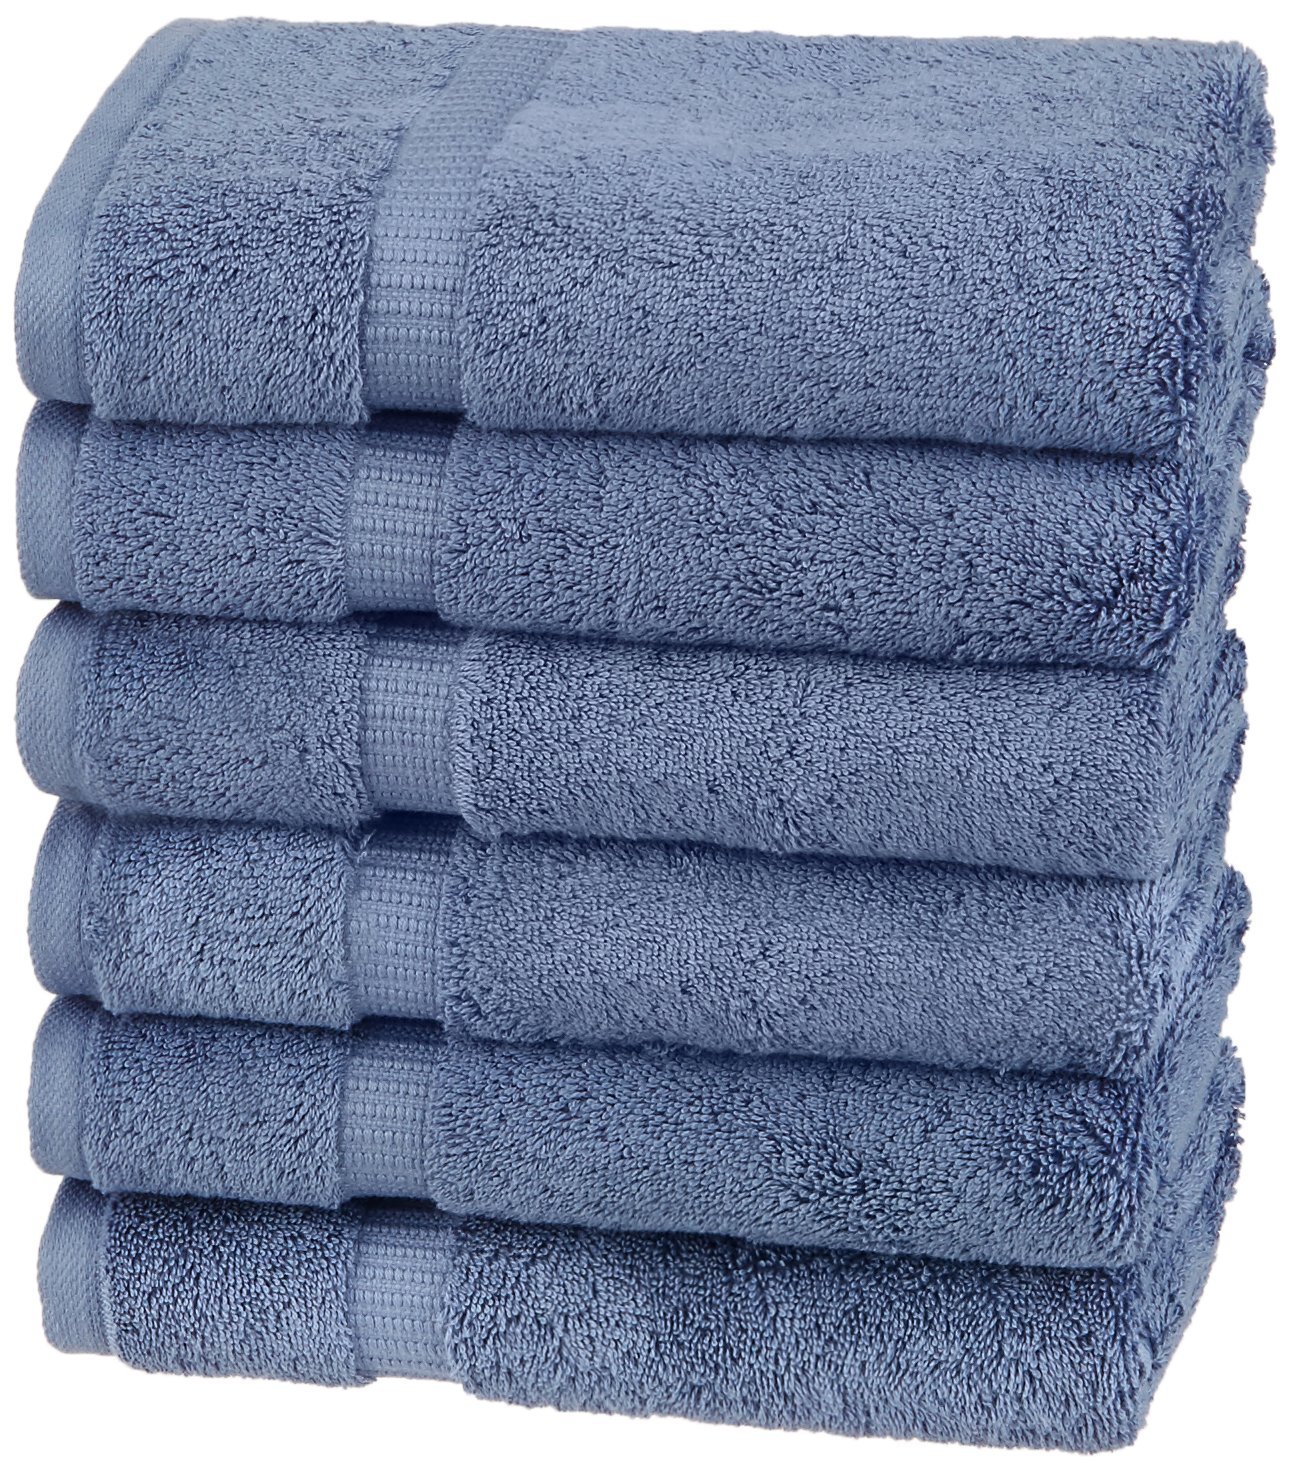 Pinzon Organic Cotton Hand Towels, Set of 6, Indigo Blue